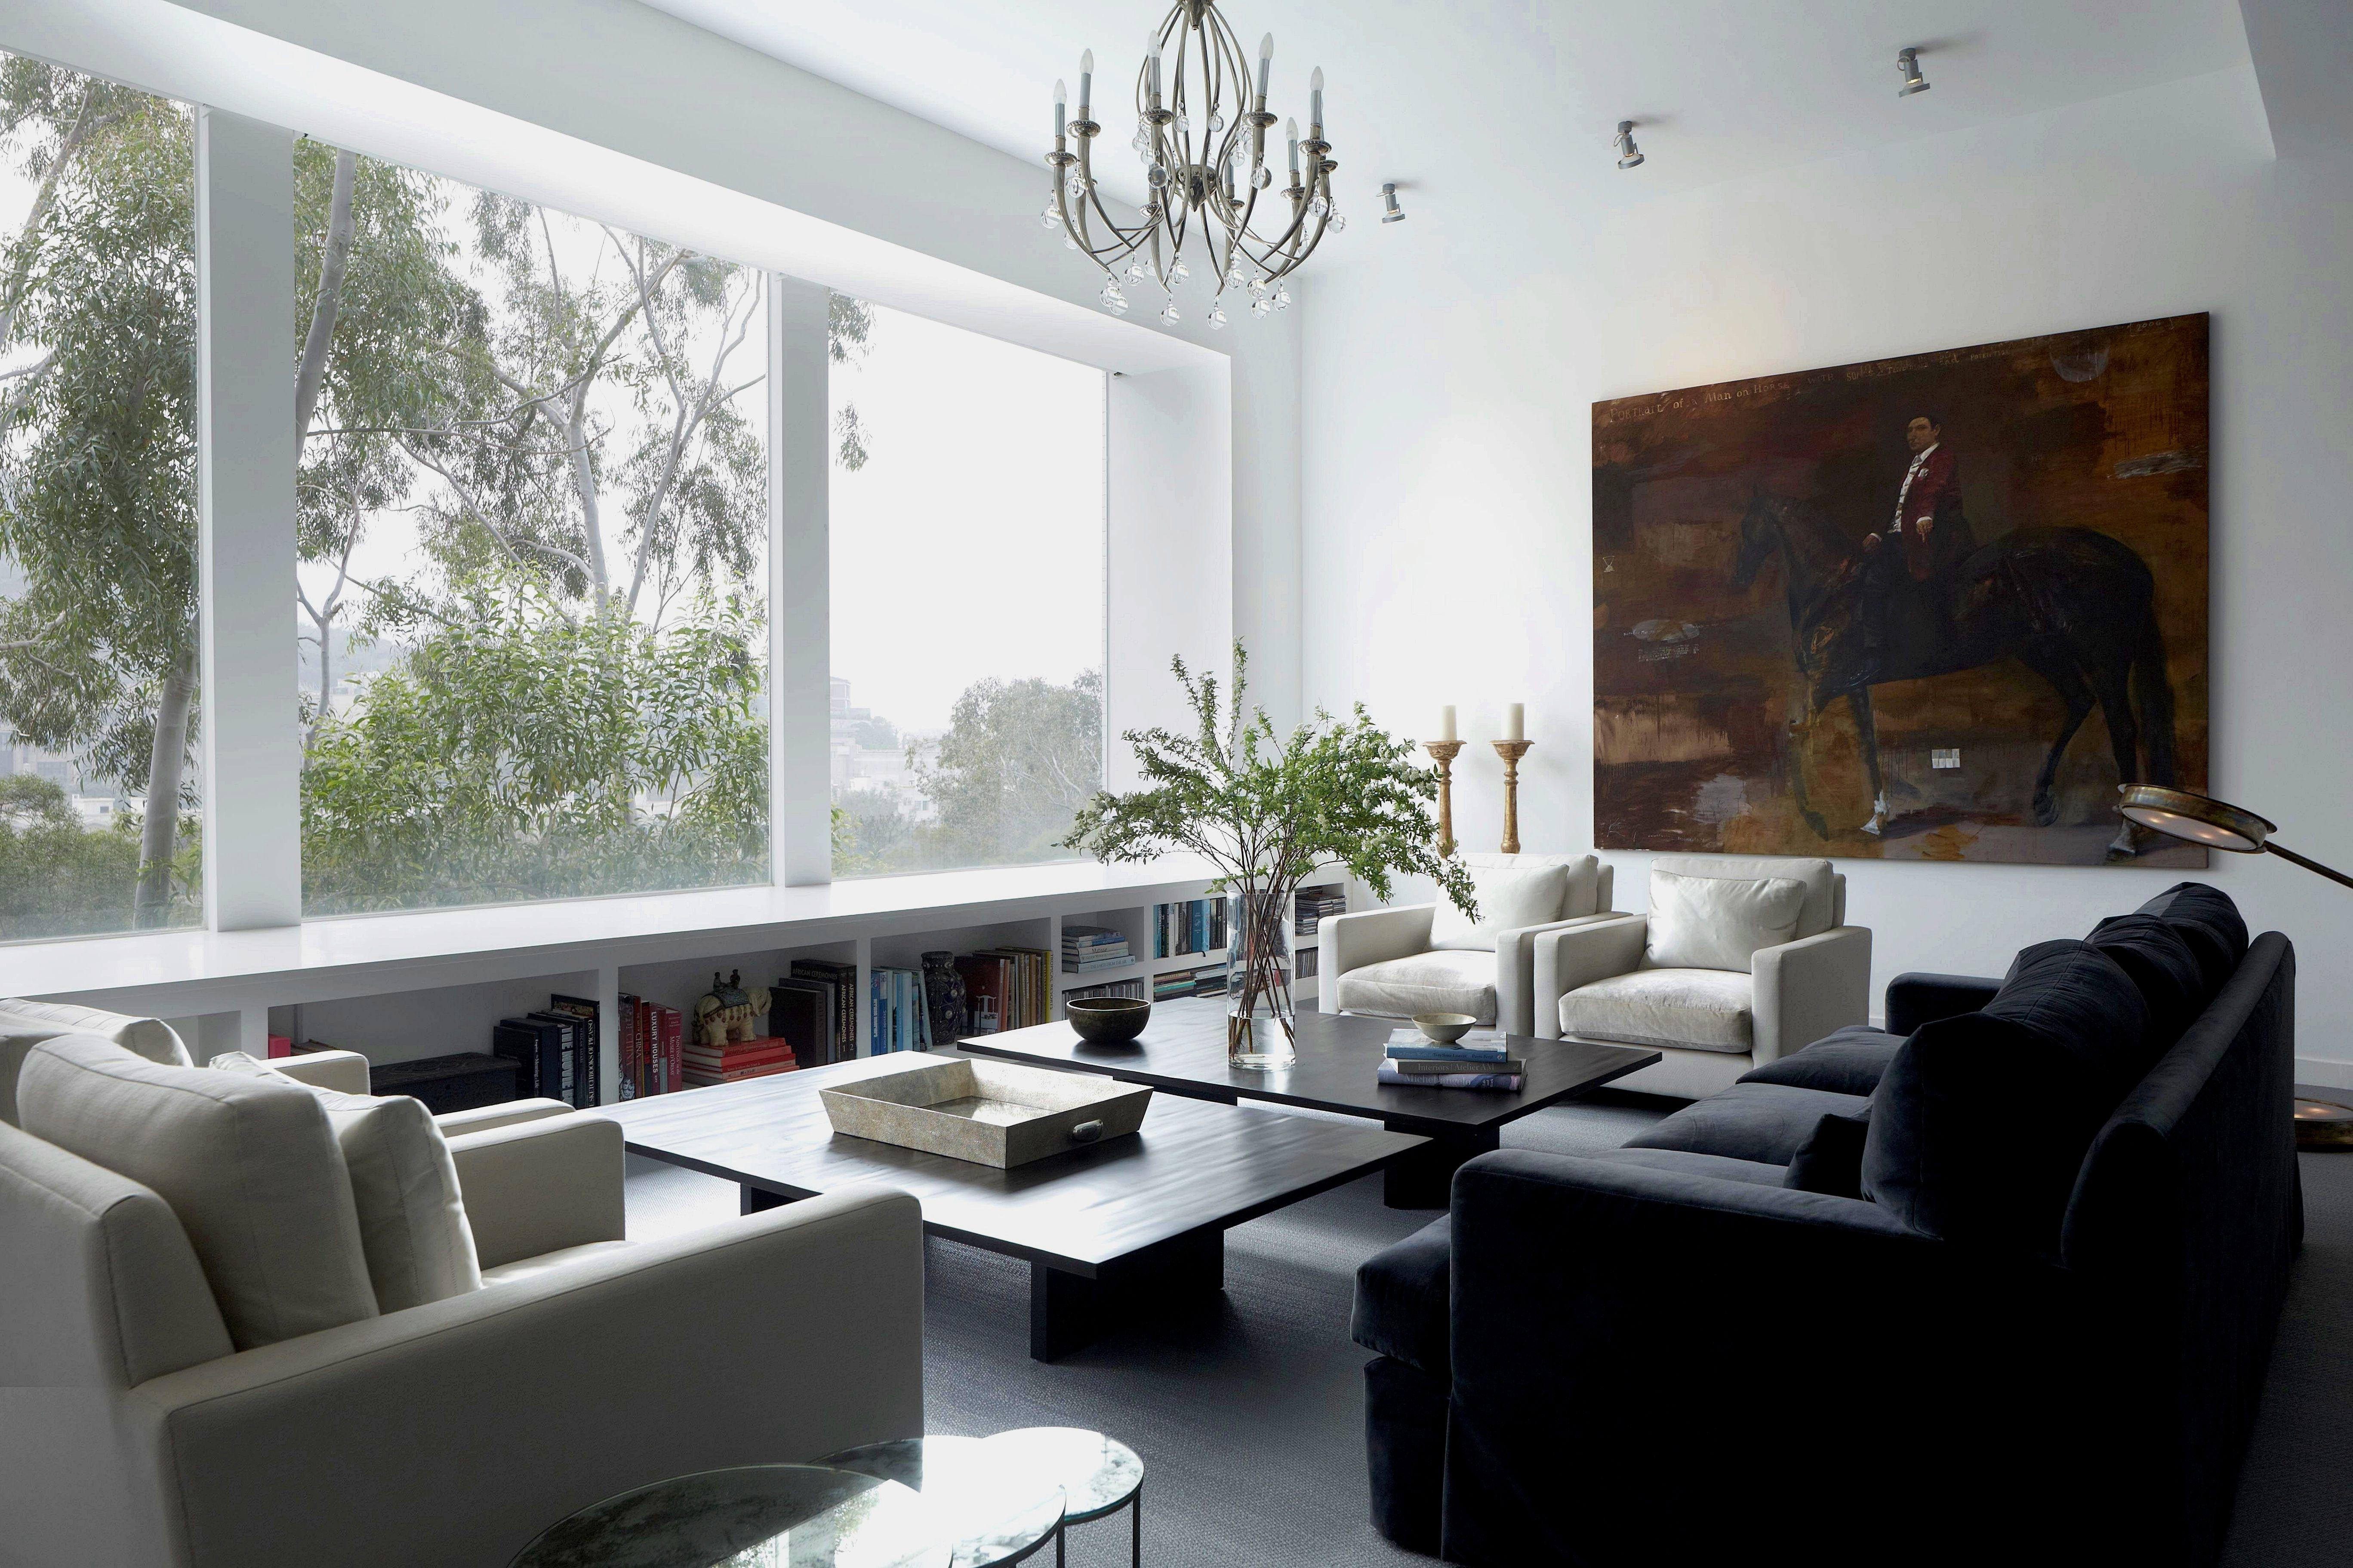 Living Room Design Tips A Fantastic Decor Tip Is Applying The